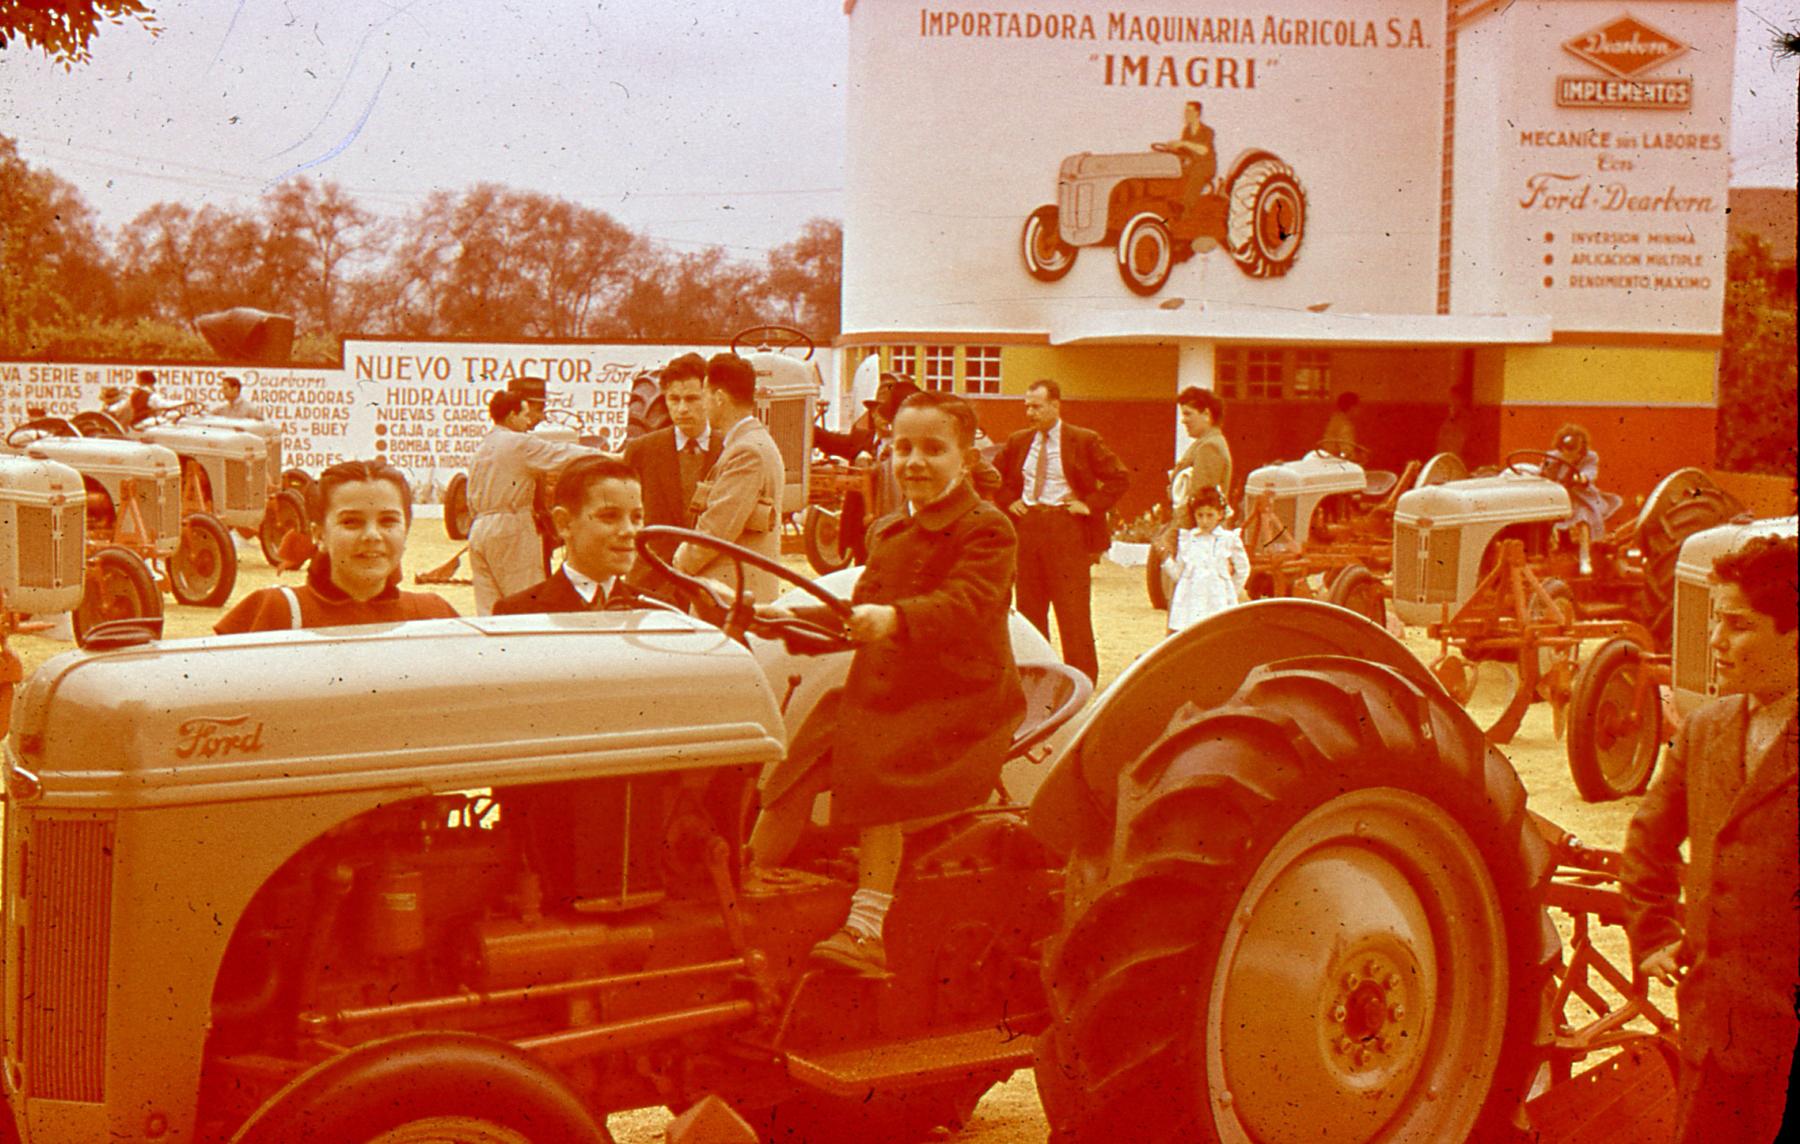 Enterreno - Fotos históricas de chile - fotos antiguas de Chile - Fisa o similar, 1948